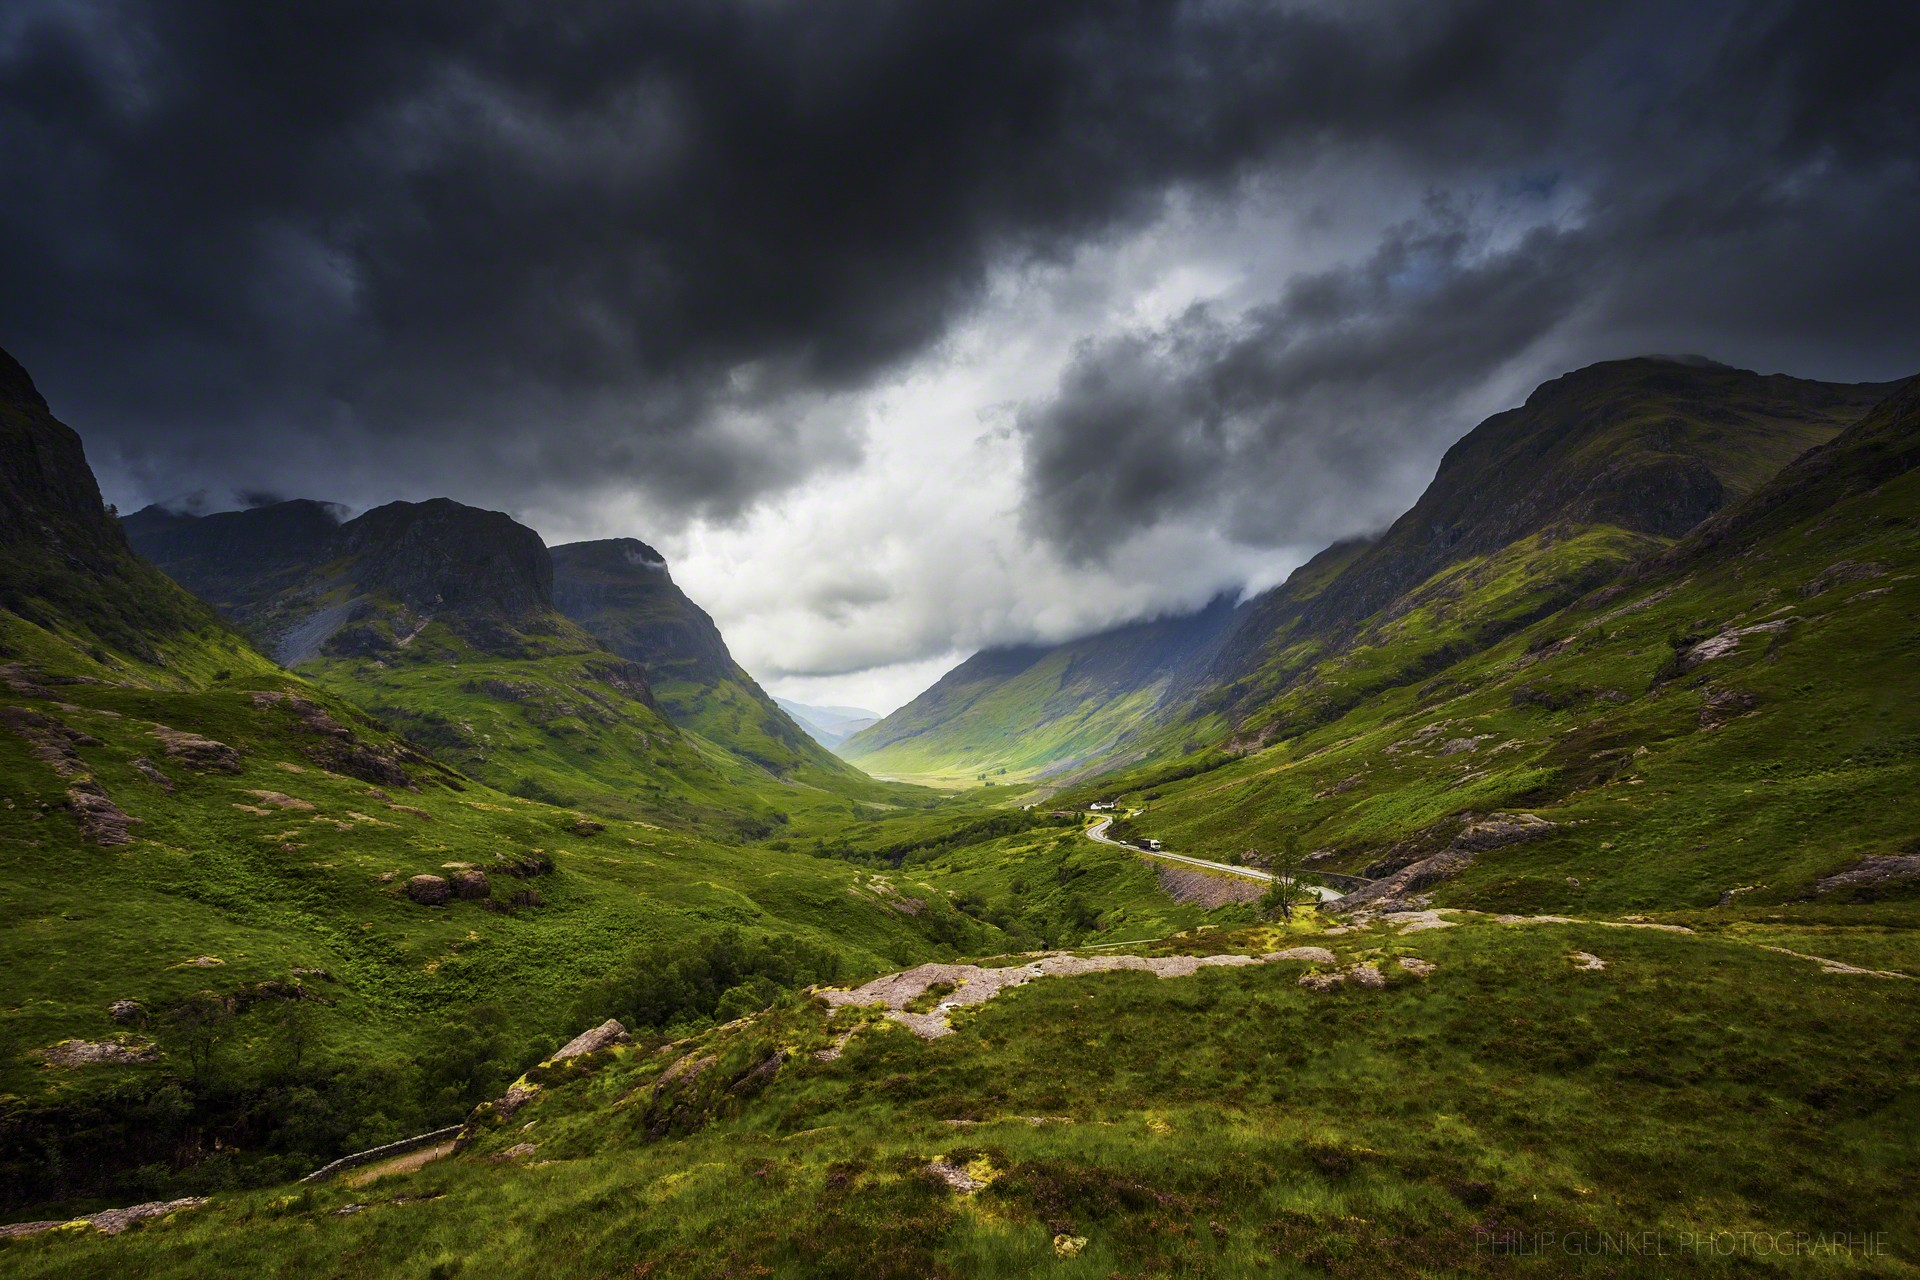 scotland_philip_gunkel_photographie_www.philipgunkel.de08